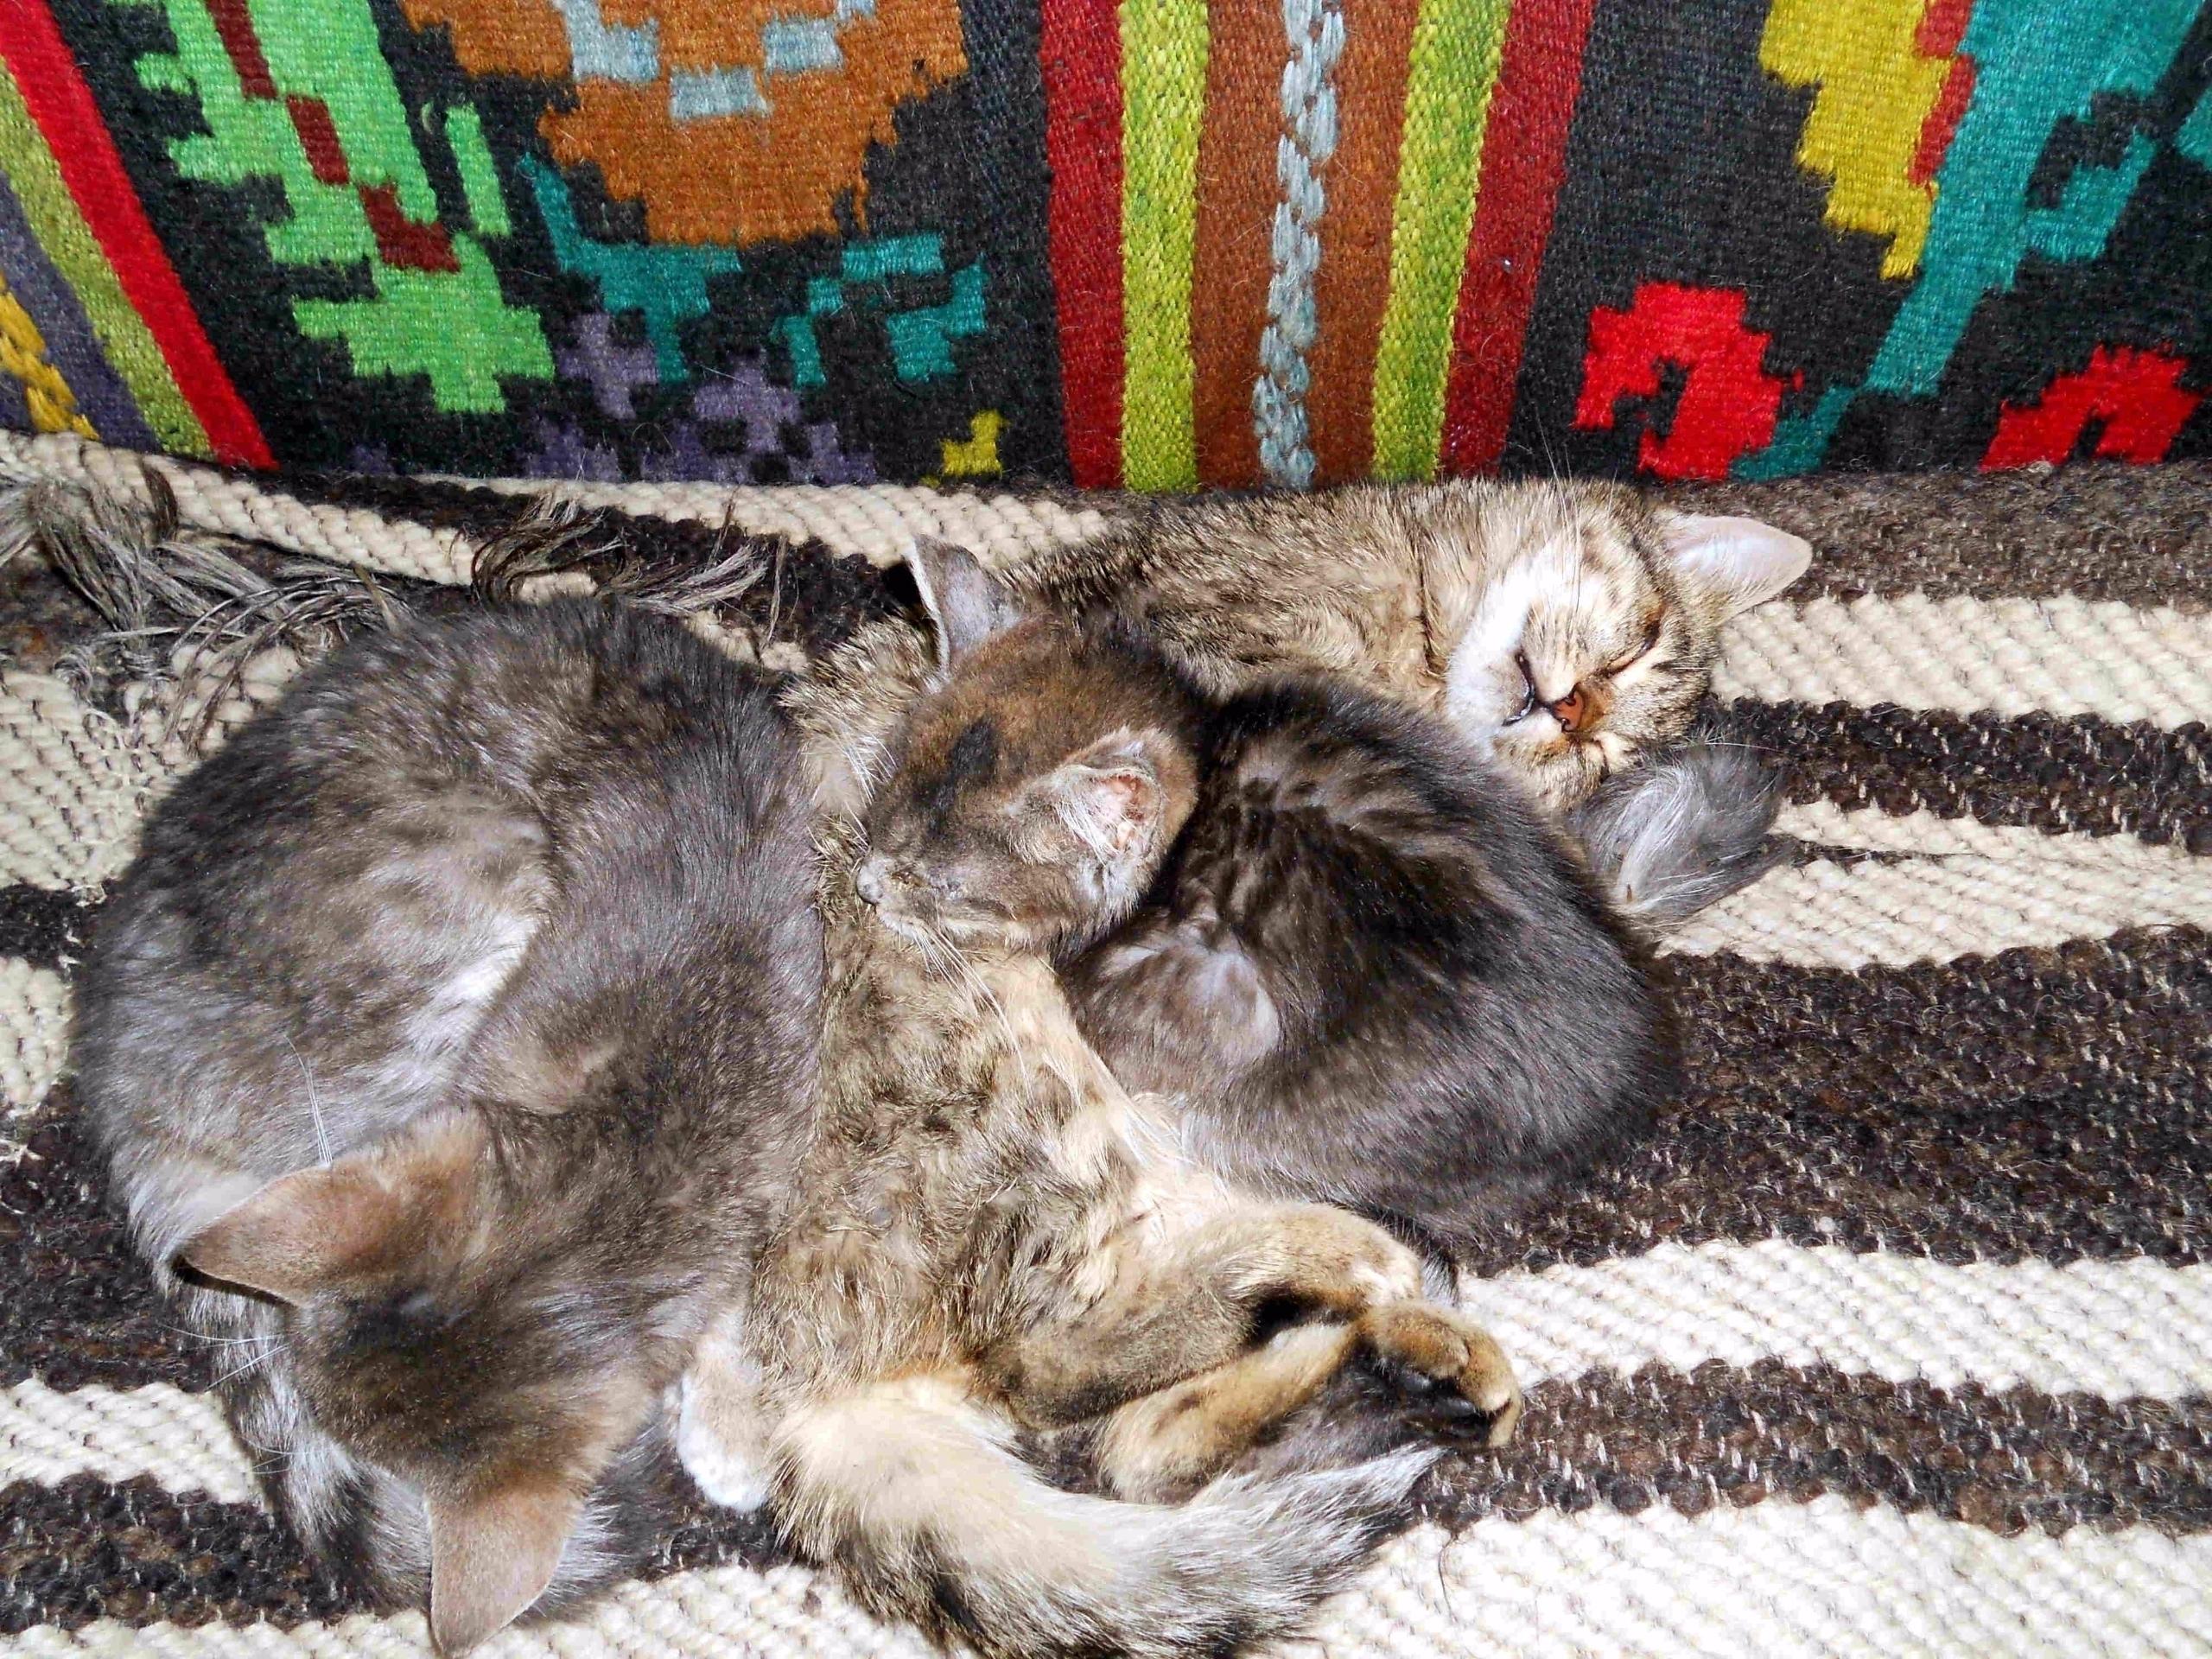 Cats napping Byzantine Hutsul c - fondator | ello